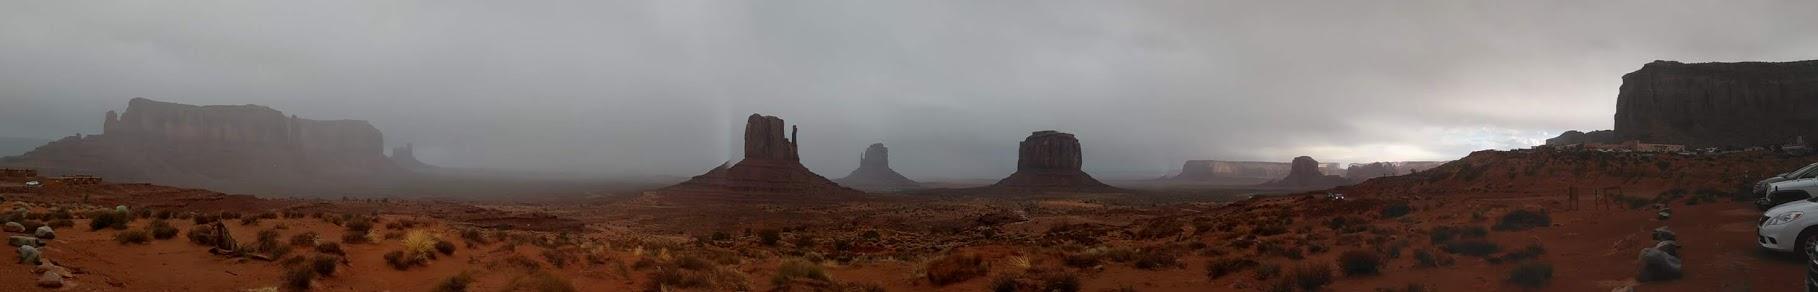 PHOTO_20181122_160955monument rain.jpg